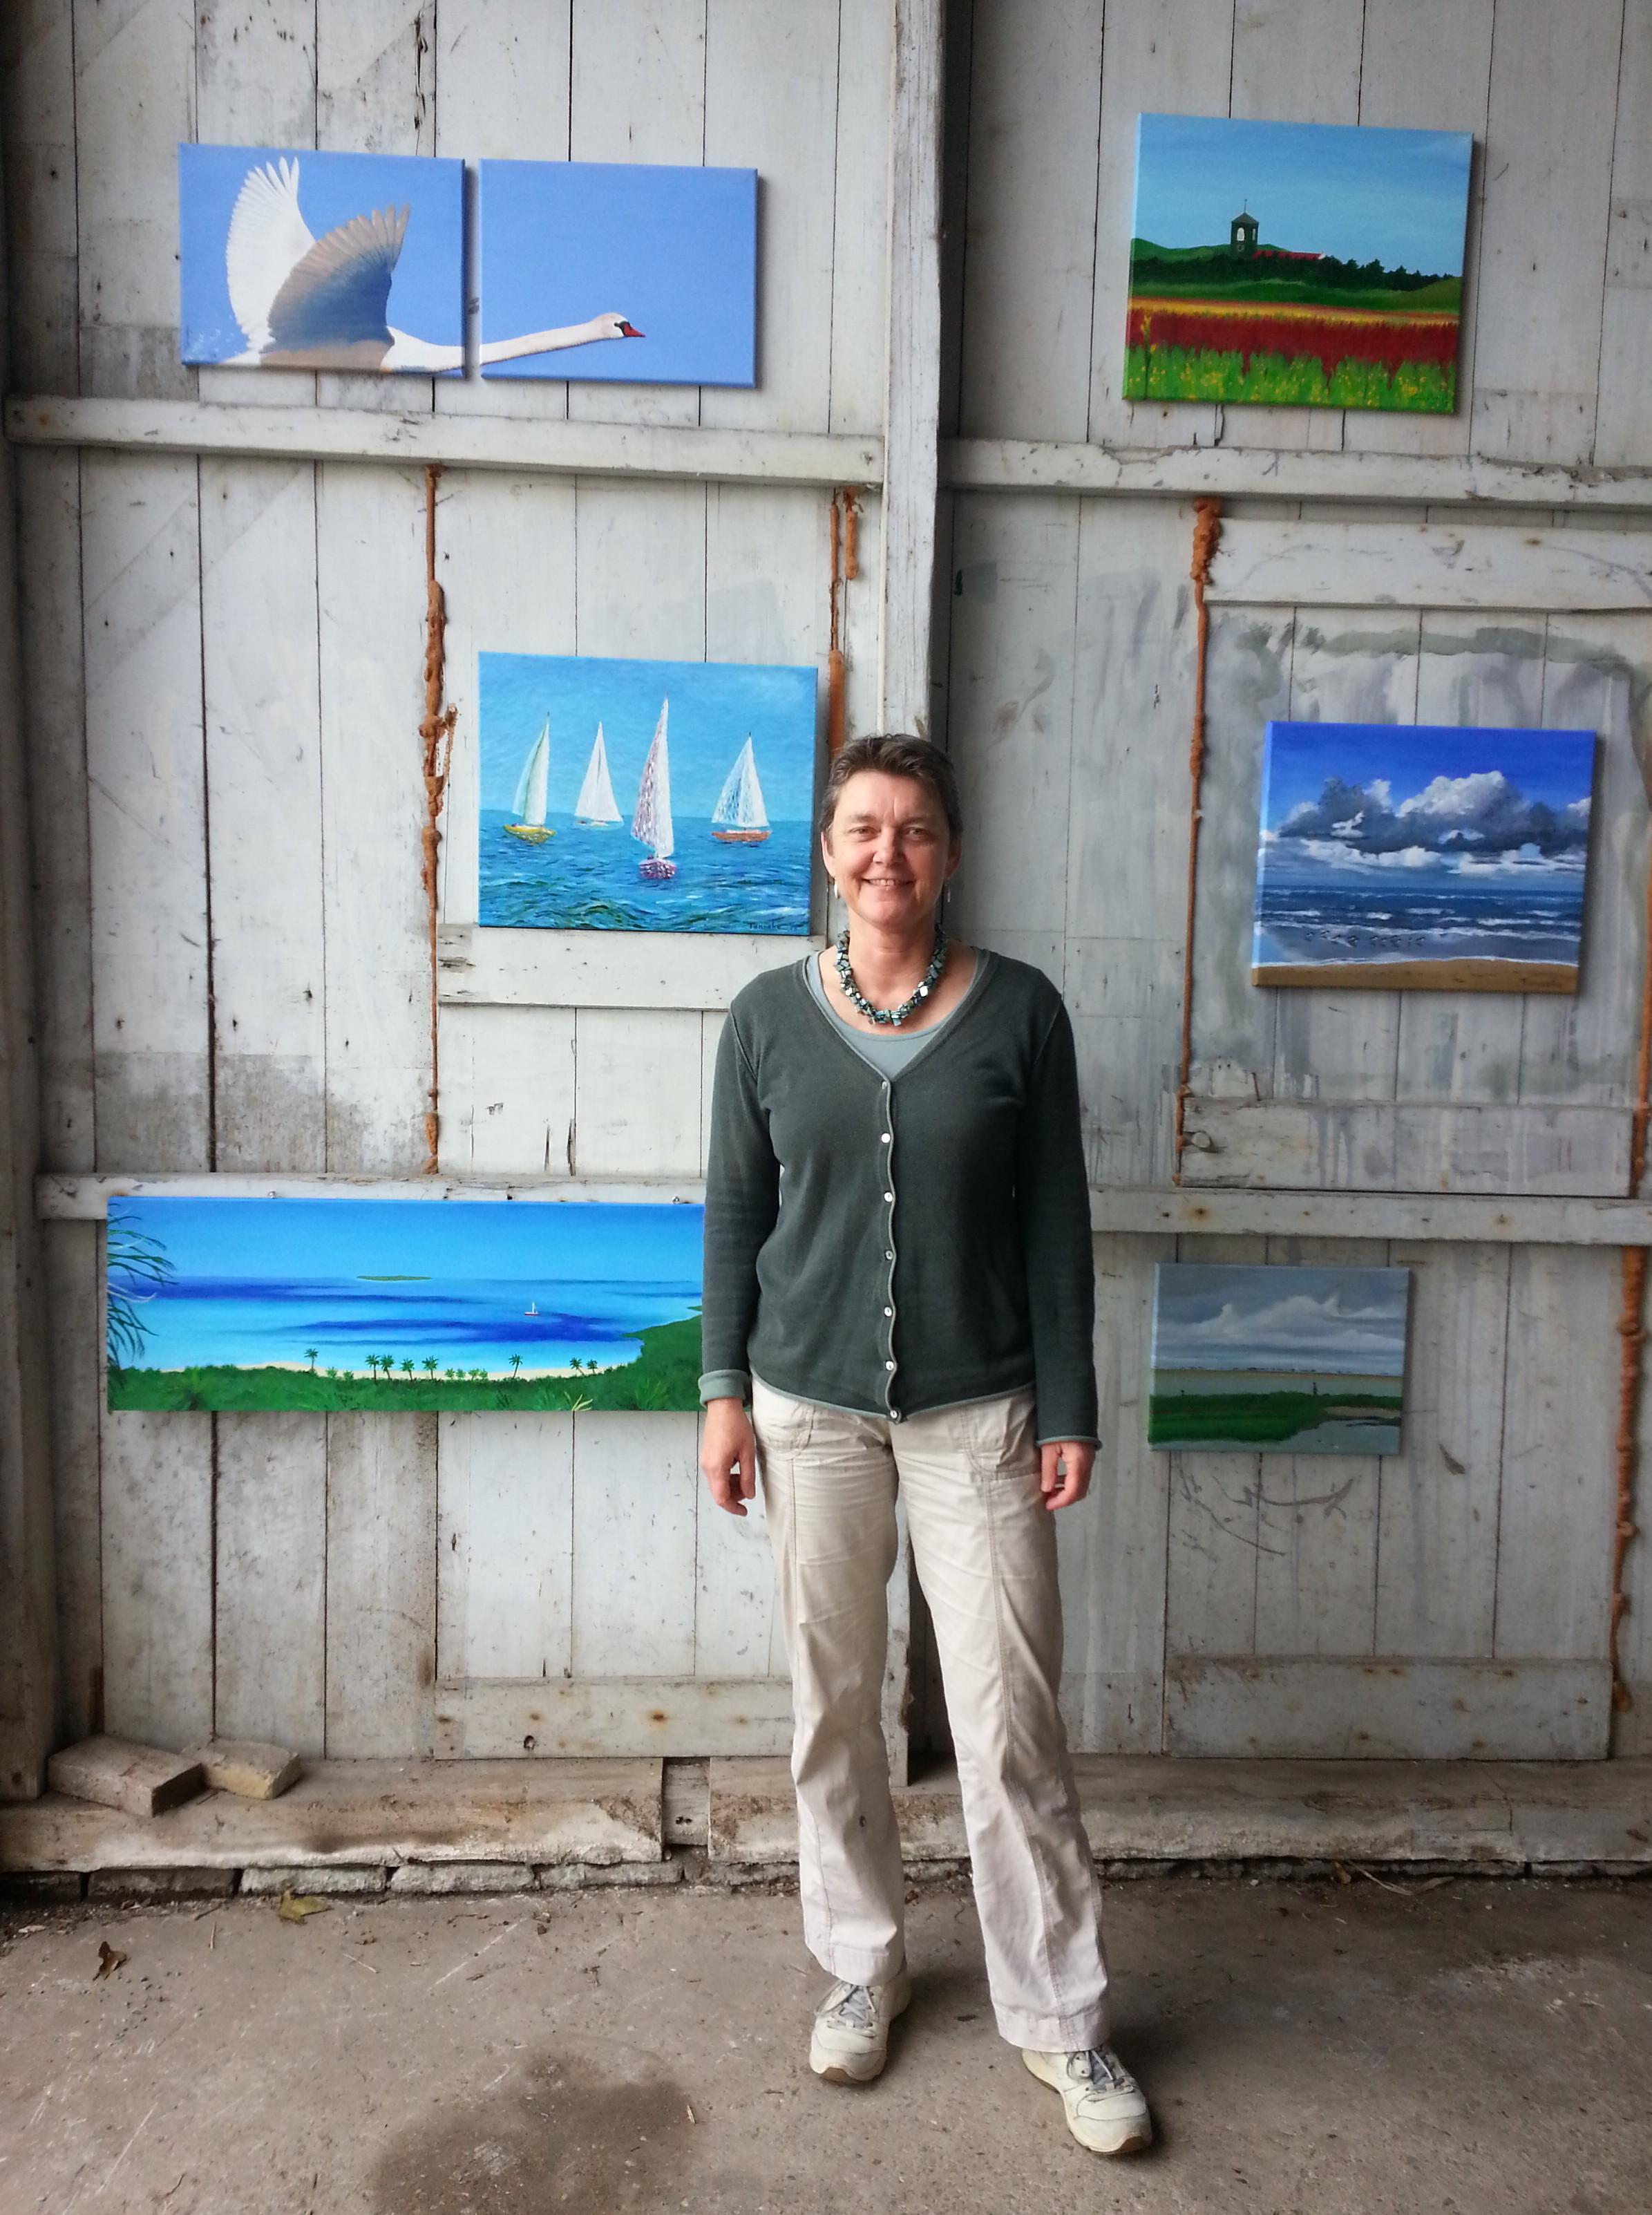 Fenneke Stegehuis Kunstroute Art Callantsoog 2017